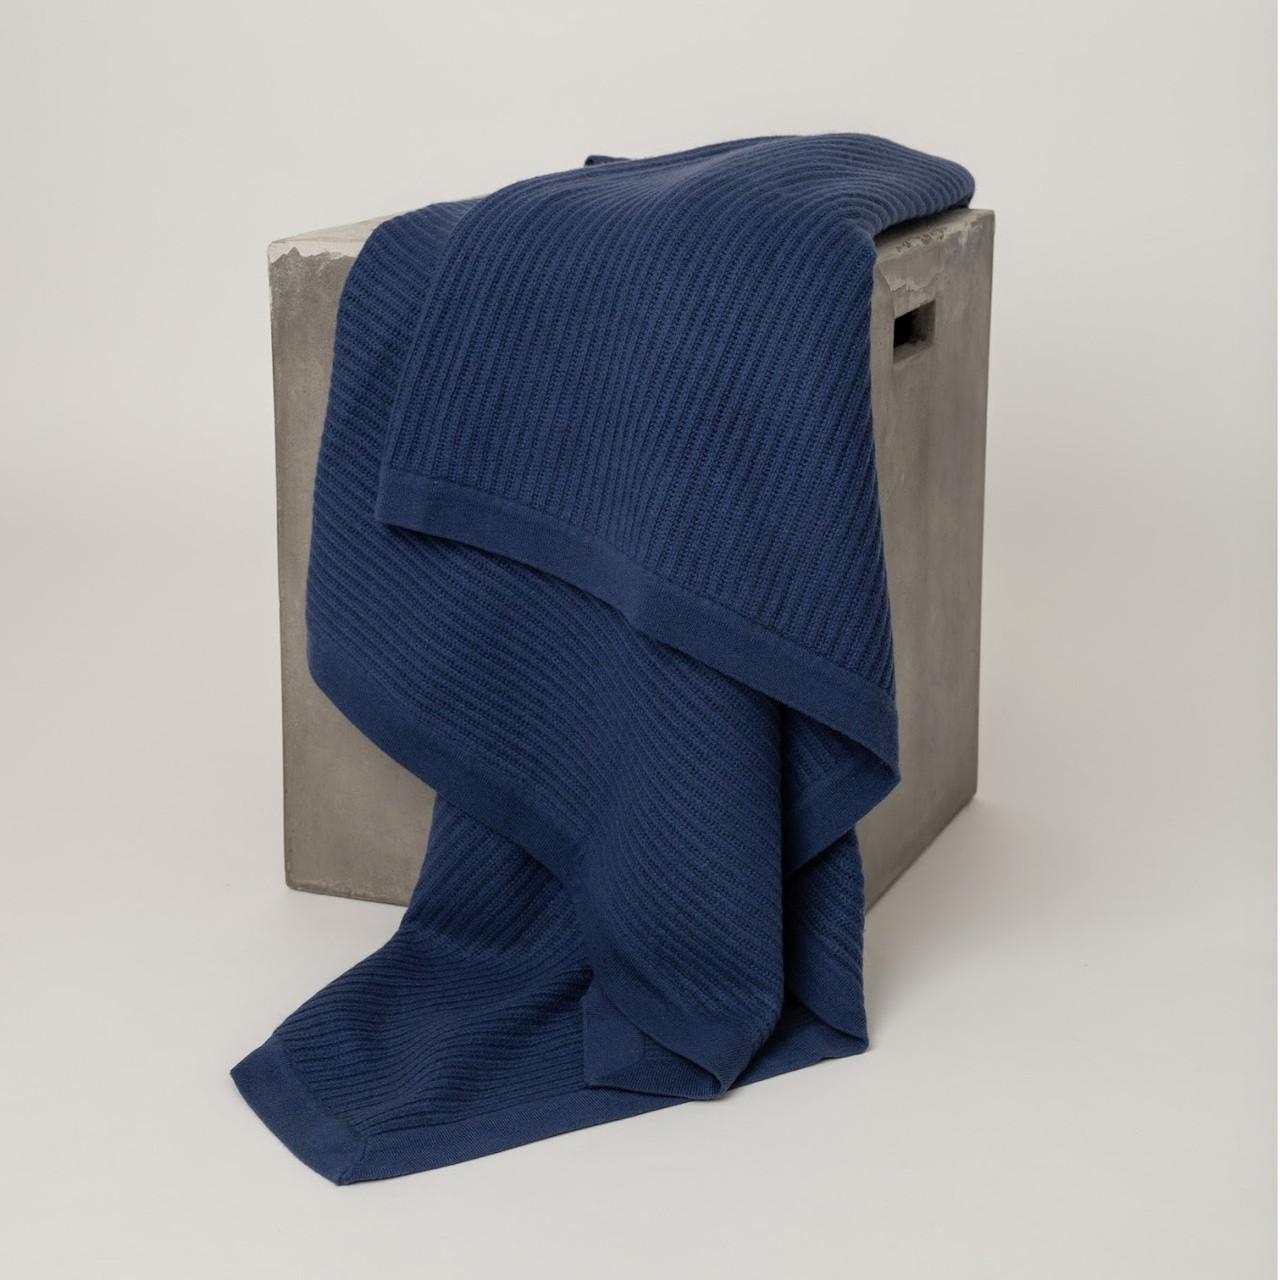 Cobalt Blue Fisherman's Knit Cashmere Throw